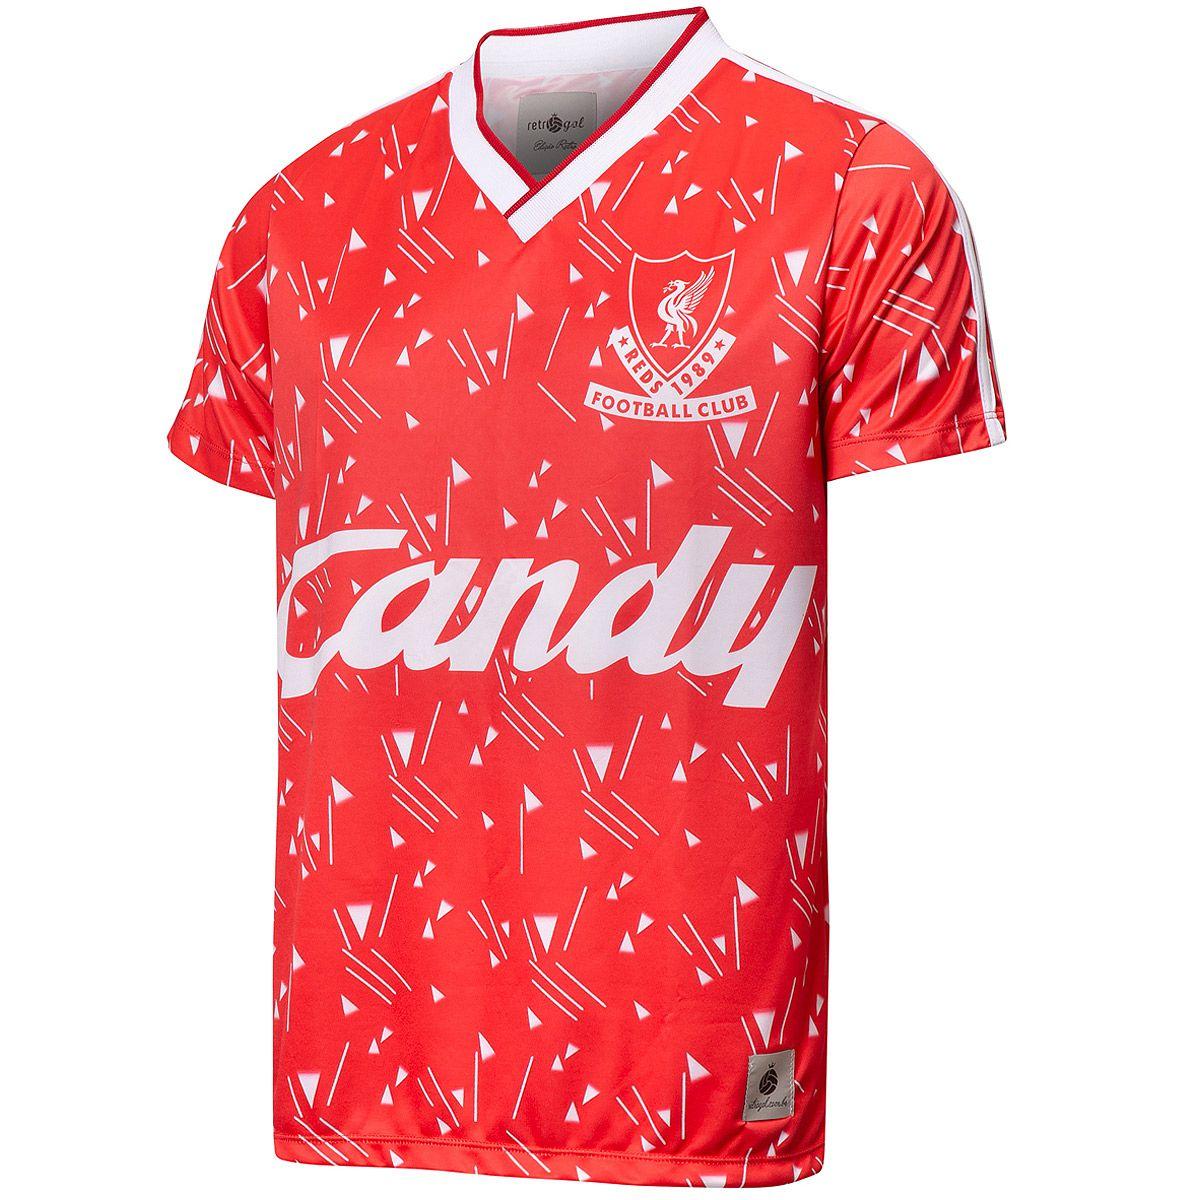 Camisa Liverpool 1989 Retrô Candy Masculino